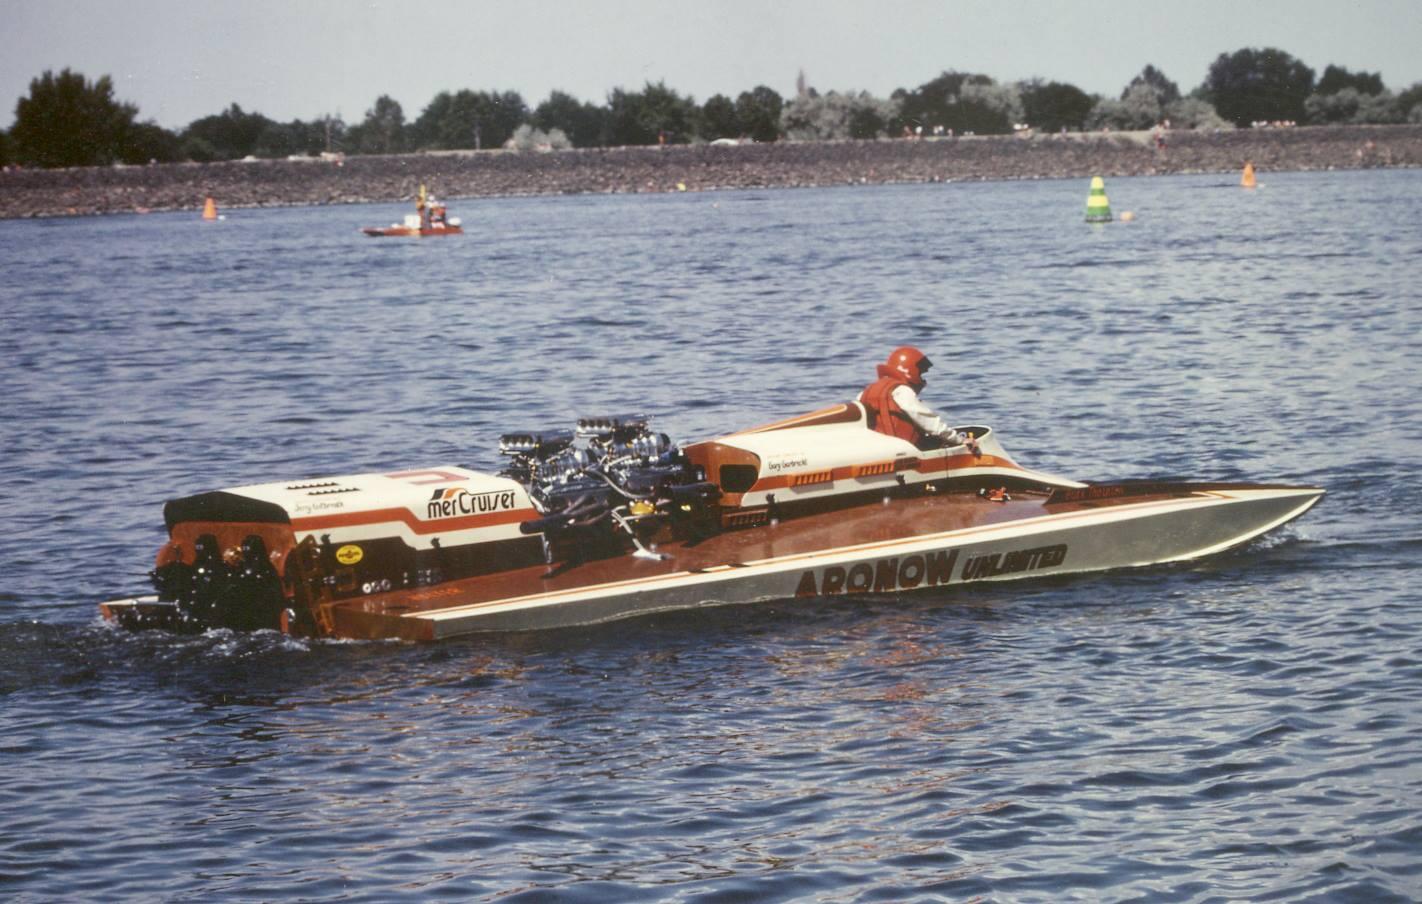 Buck on Omc Boat Engines